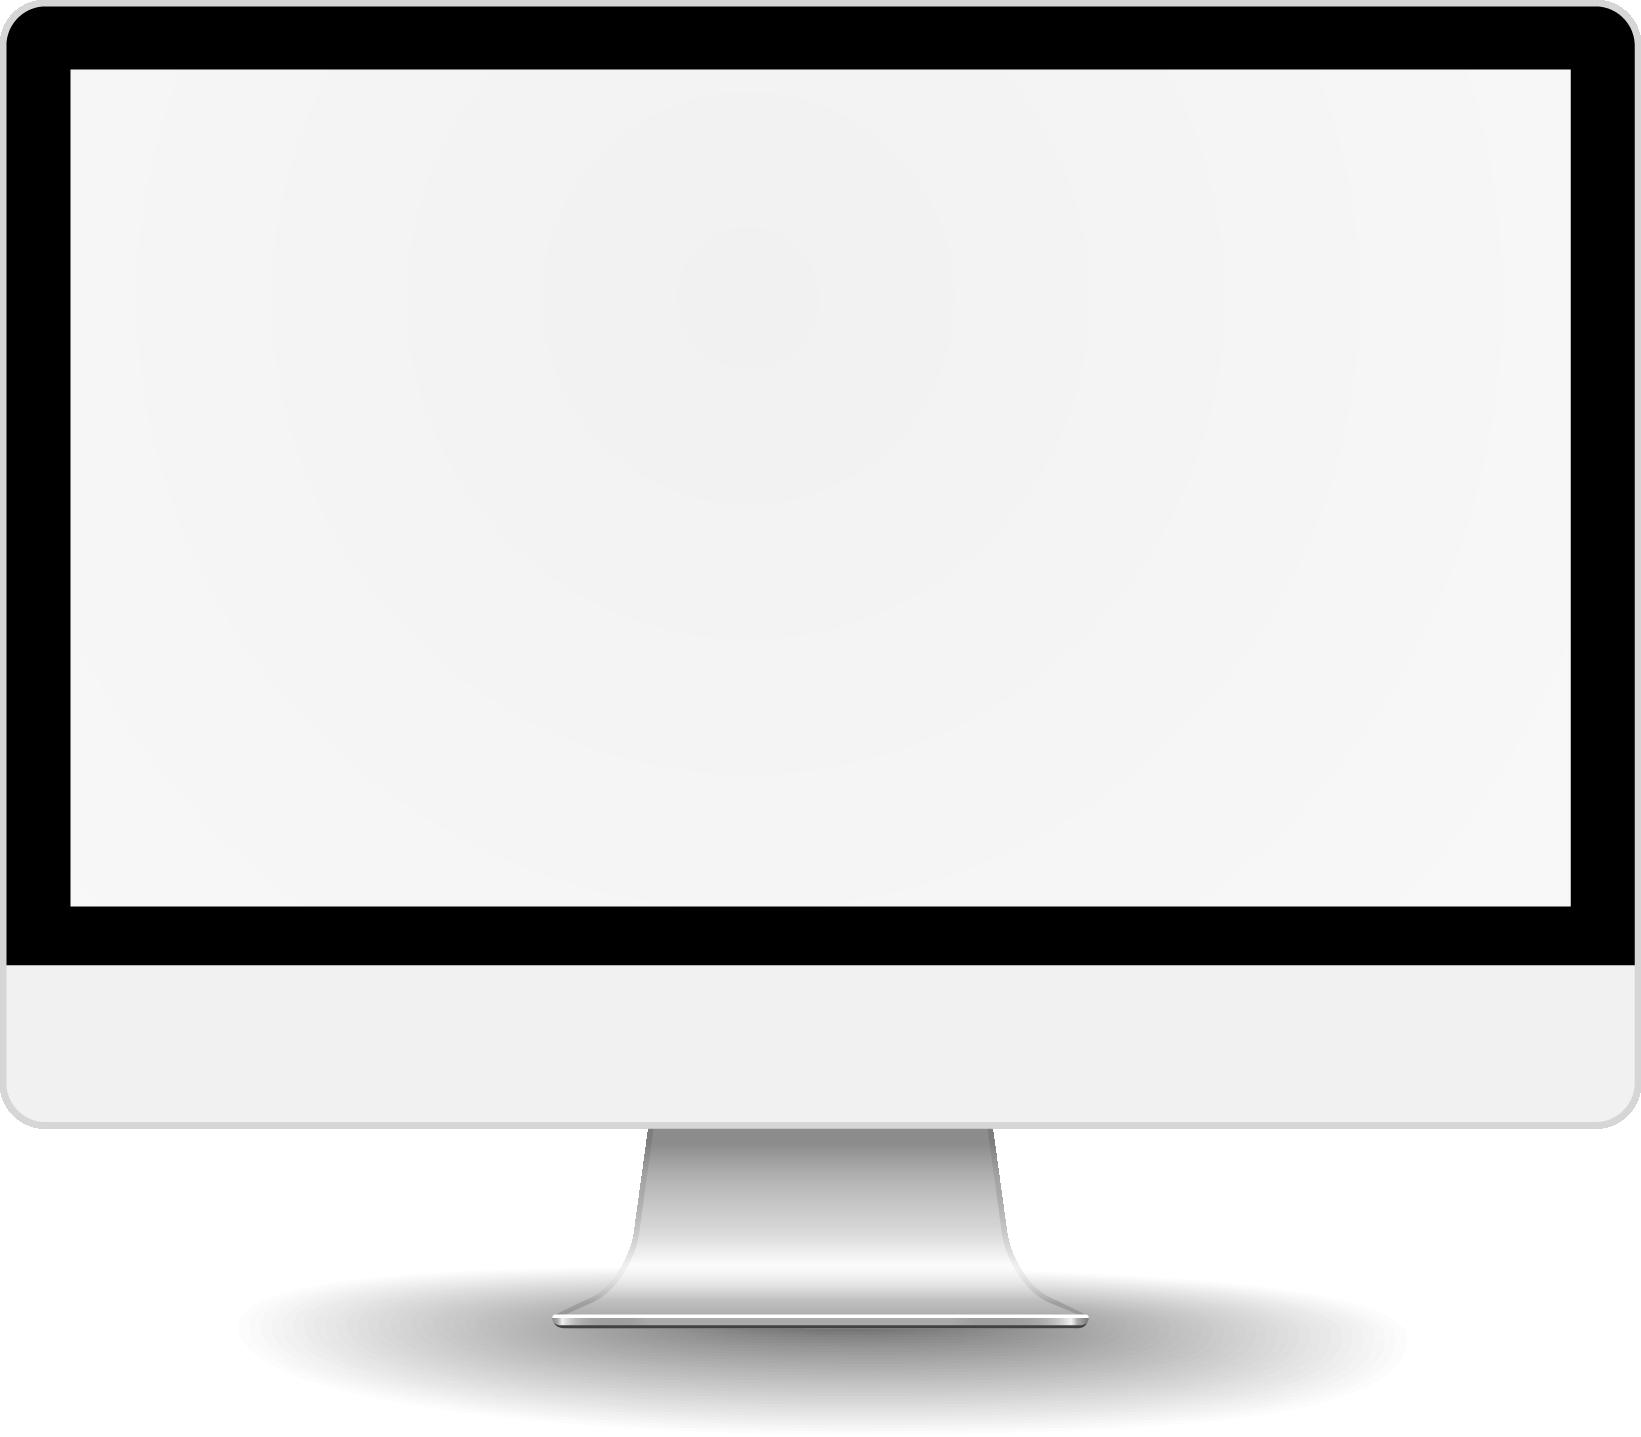 Pc clipart design computer. Home paashruti